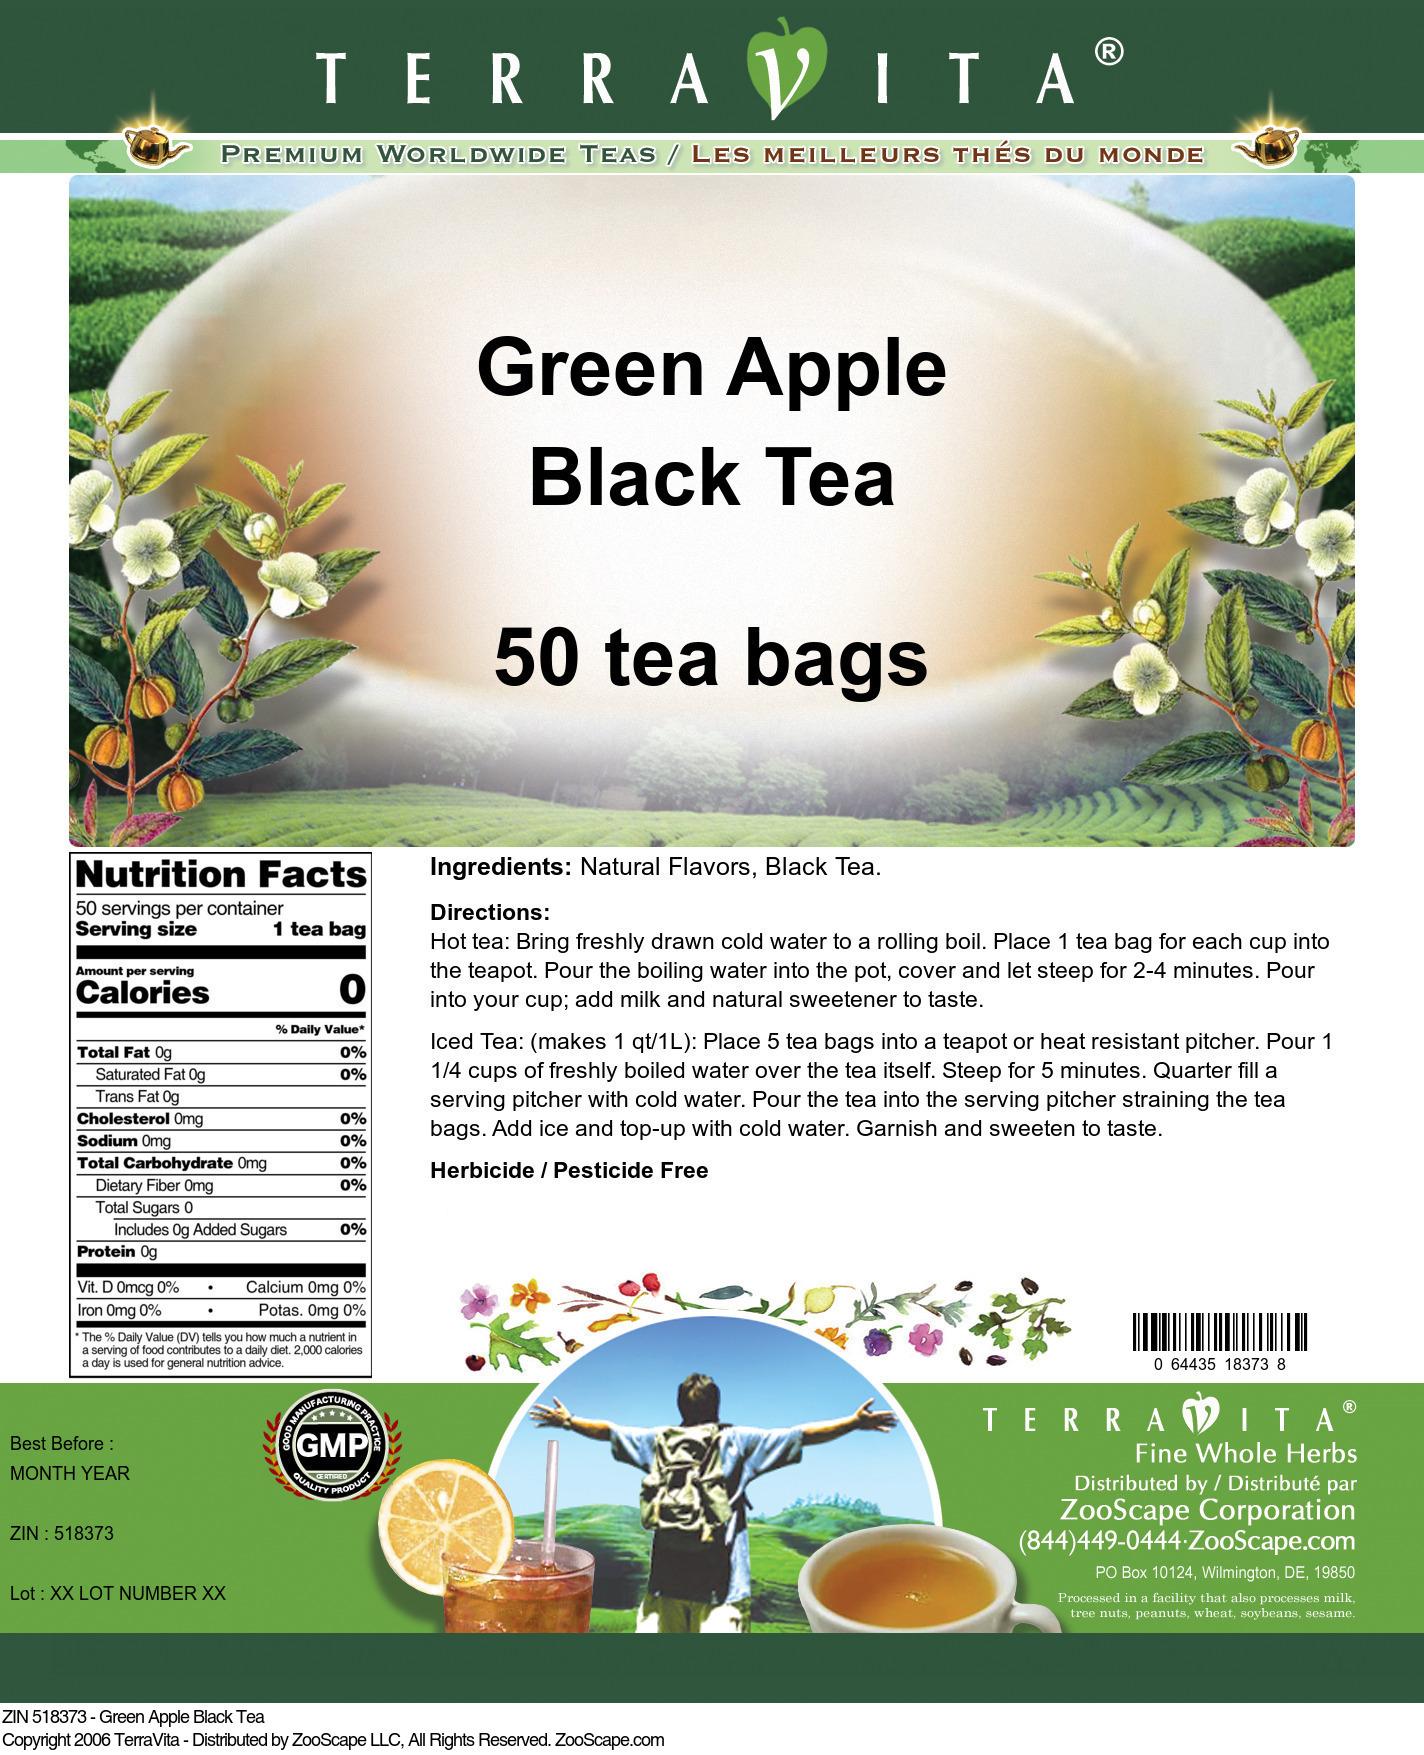 Green Apple Black Tea